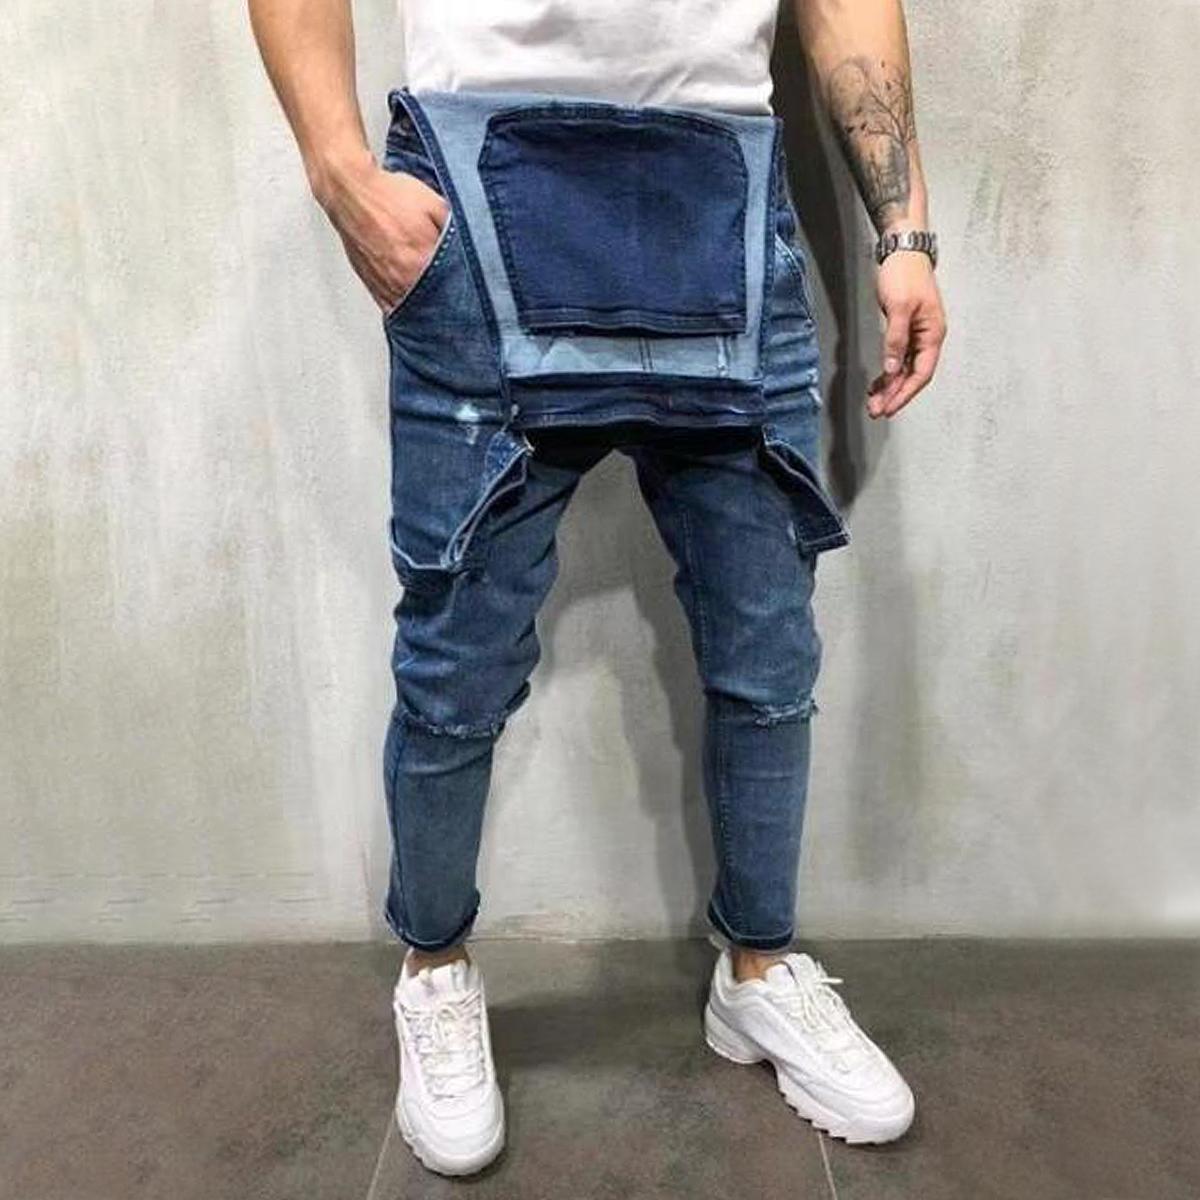 Correa-De-Hombre-Denim-Jeans-Mono-Mono-corto-Dungaree-Pantalones-Cortos-Deshilachados-Babero-En miniatura 21